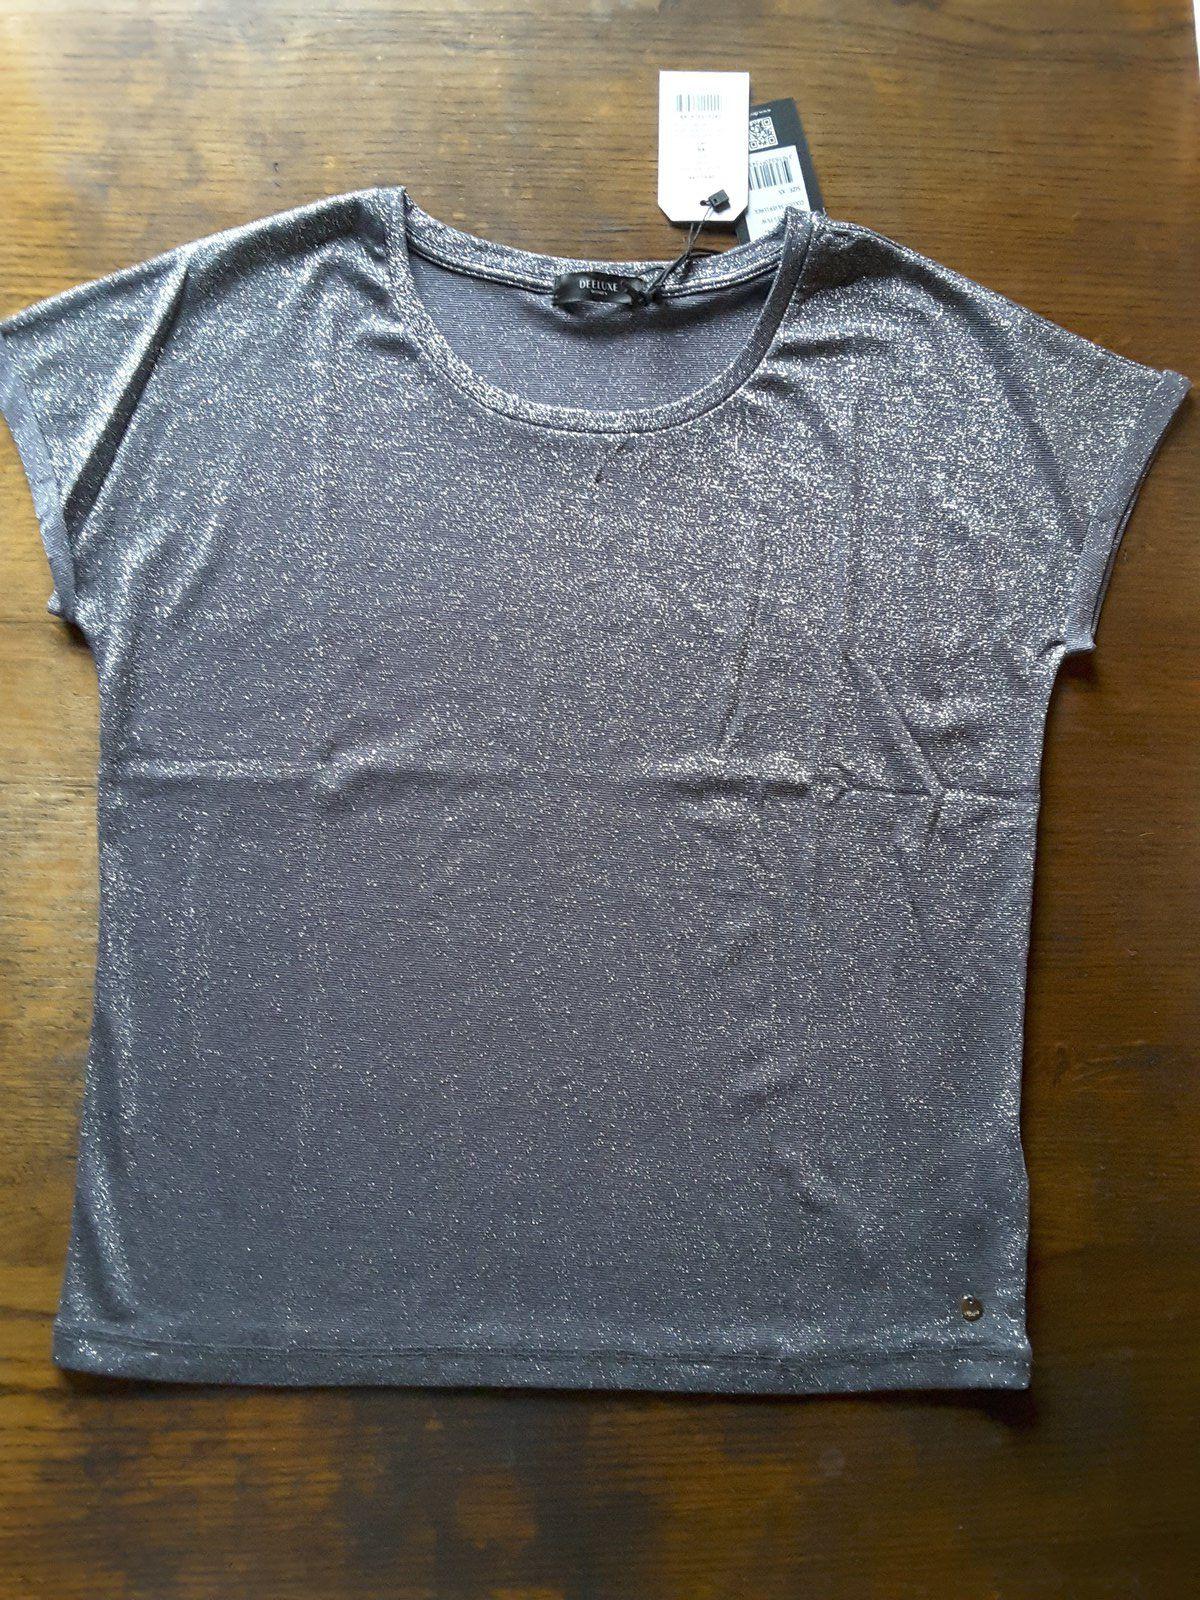 haut Dhines Tshirt Lurex silver - Deeluxe lookiero missbonsplansdunet box vêtements styliste personal shopper